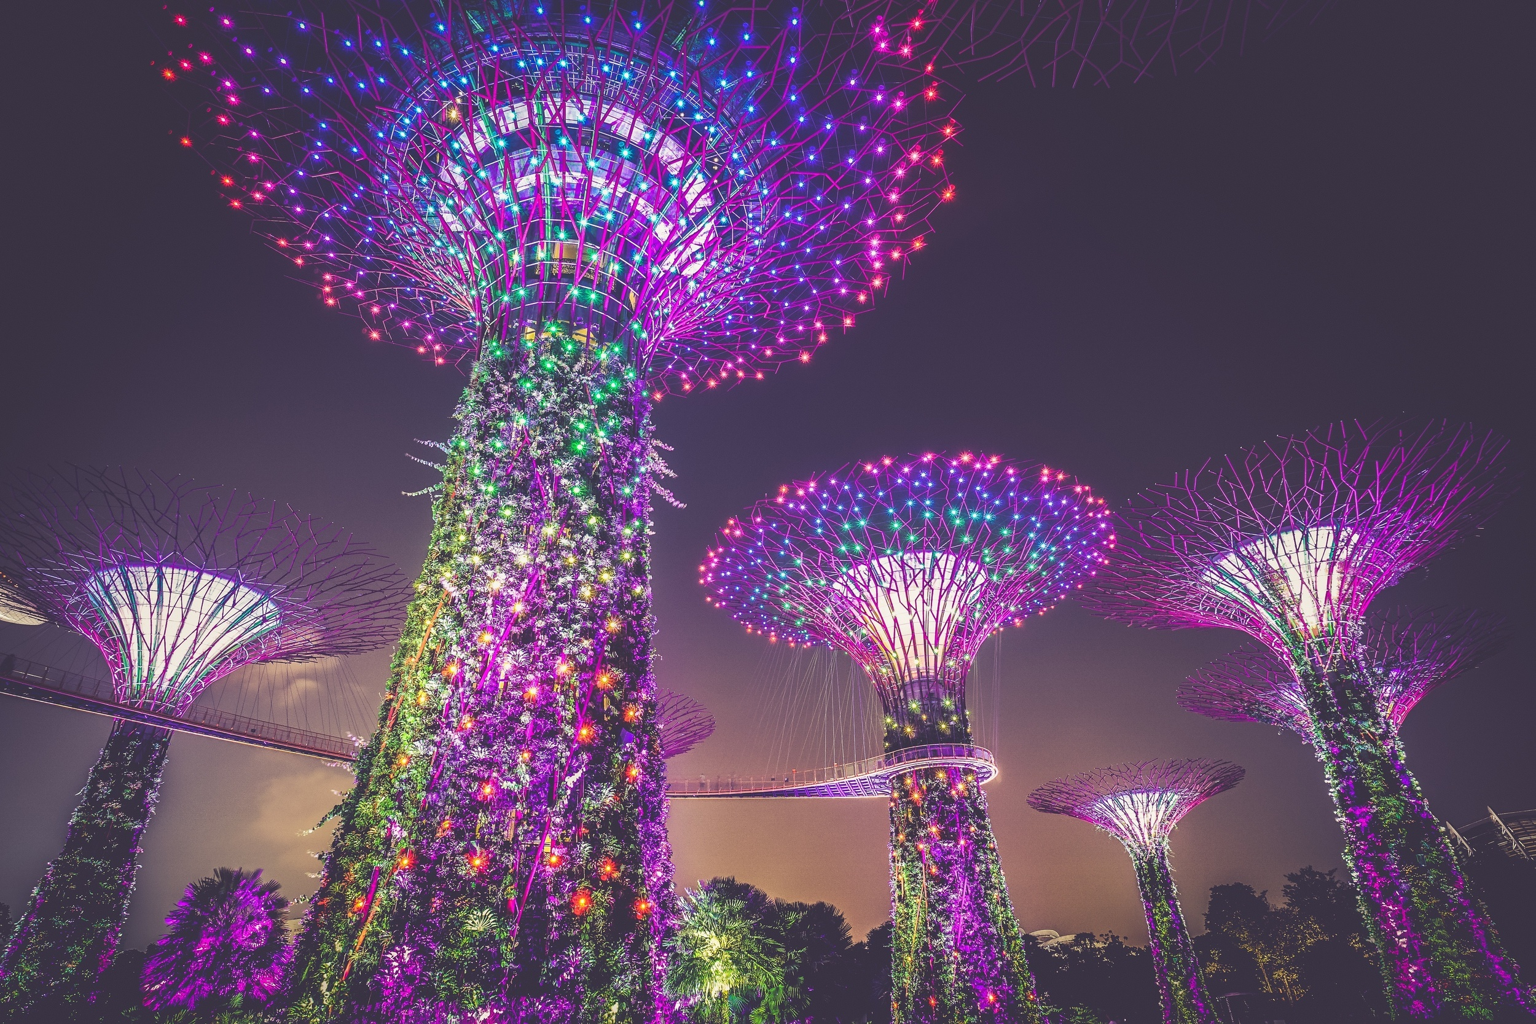 night-flower-park-christmas-decoration-lights-fireworks-980672-pxhere.com